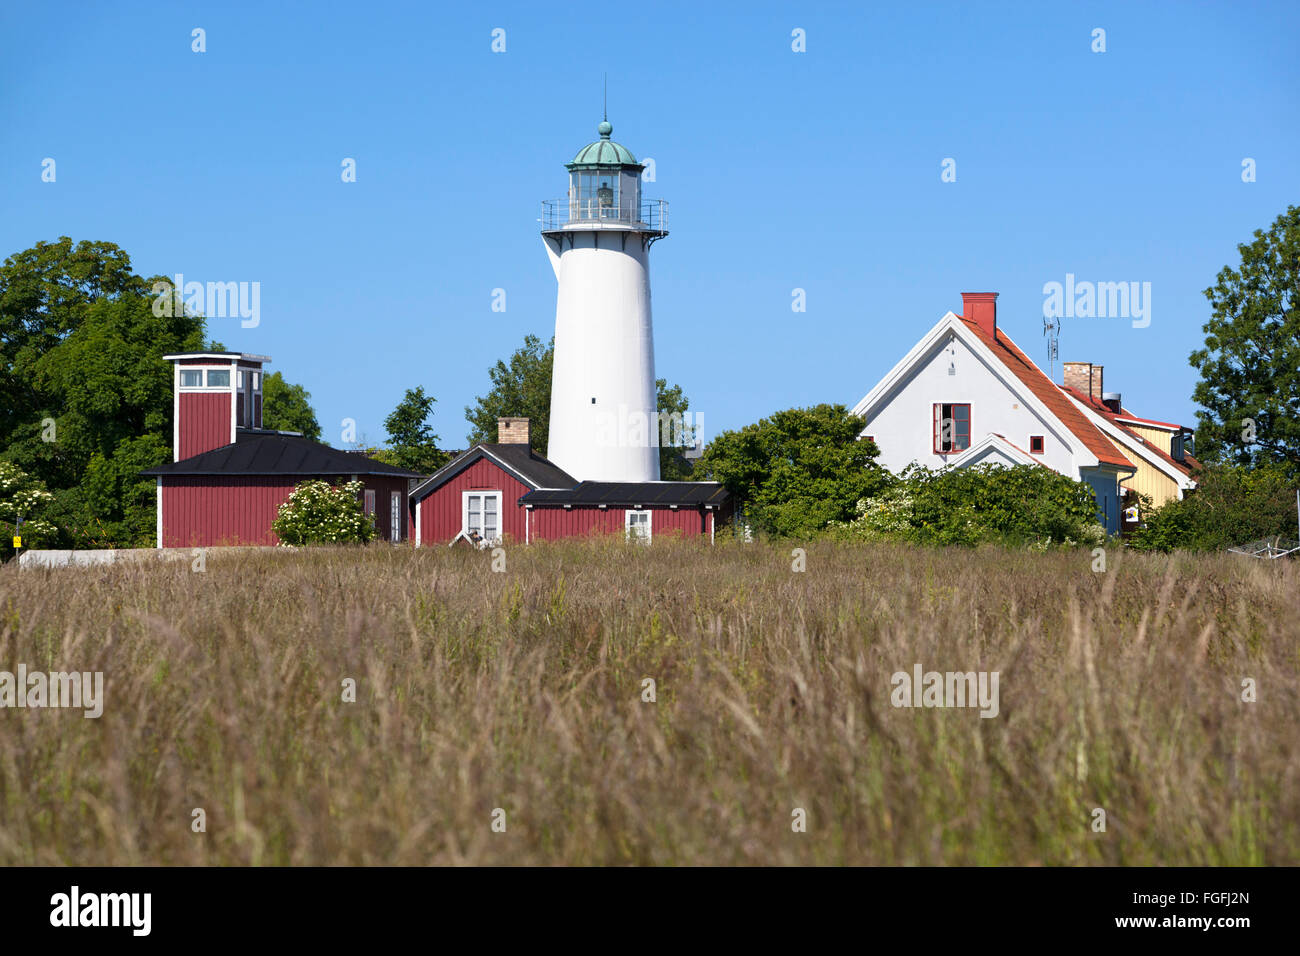 Smygehuk lighthouse hostel, Smygehuk, Skane, South Sweden, Sweden, Scandinavia, Europe - Stock Image